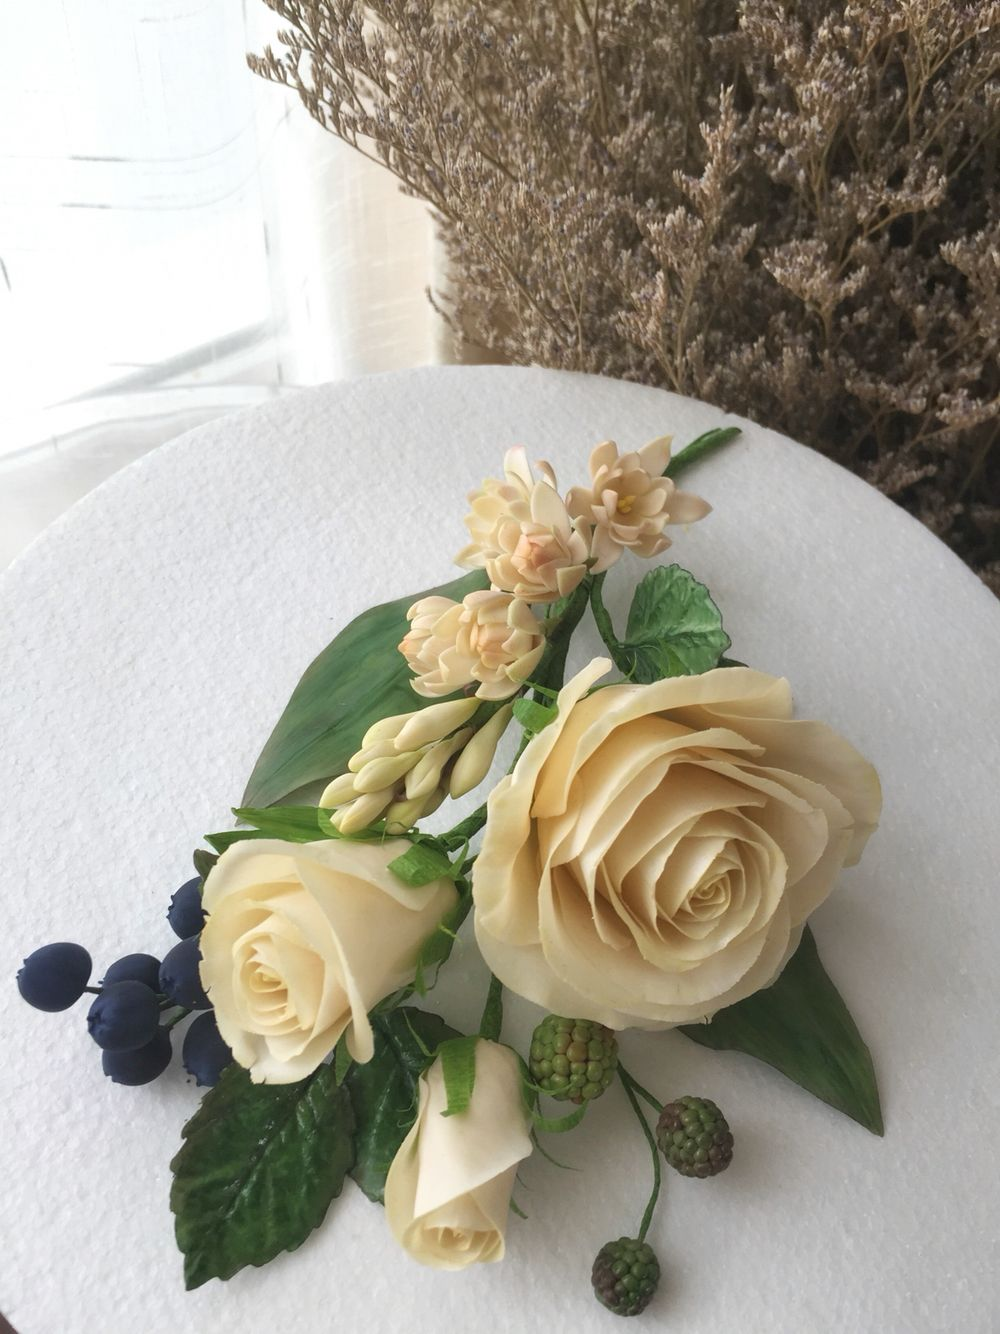 Sugar Flower Bouquet Roses And Tuberose Sugar Flowers